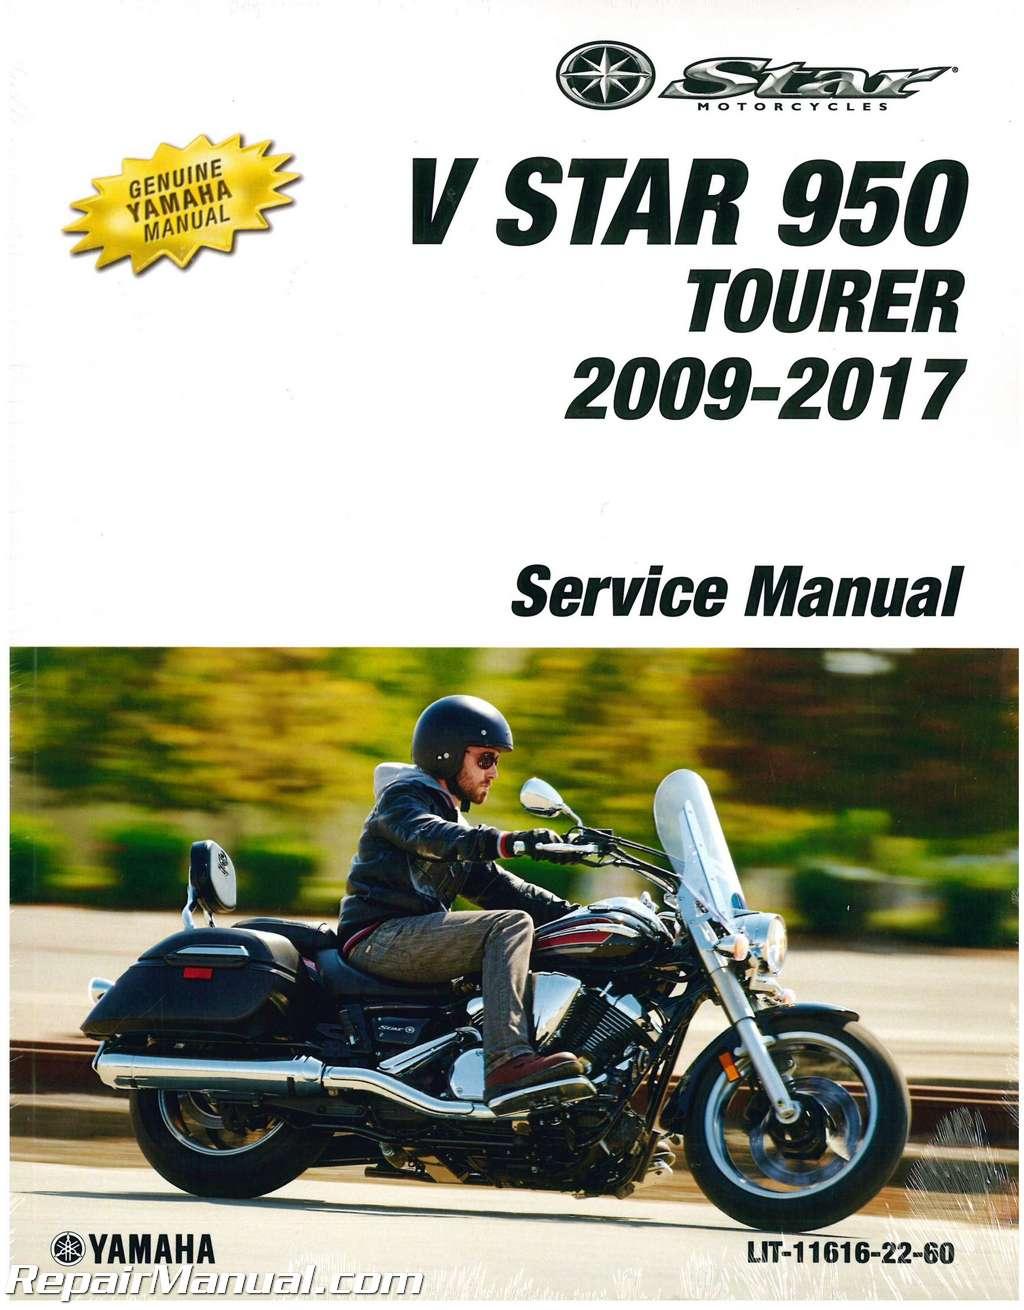 2009 2017 yamaha xvs950 v star motorcycle service manual rh repairmanual com yamaha v star service manual pdf yamaha v star 1100 service manual free download